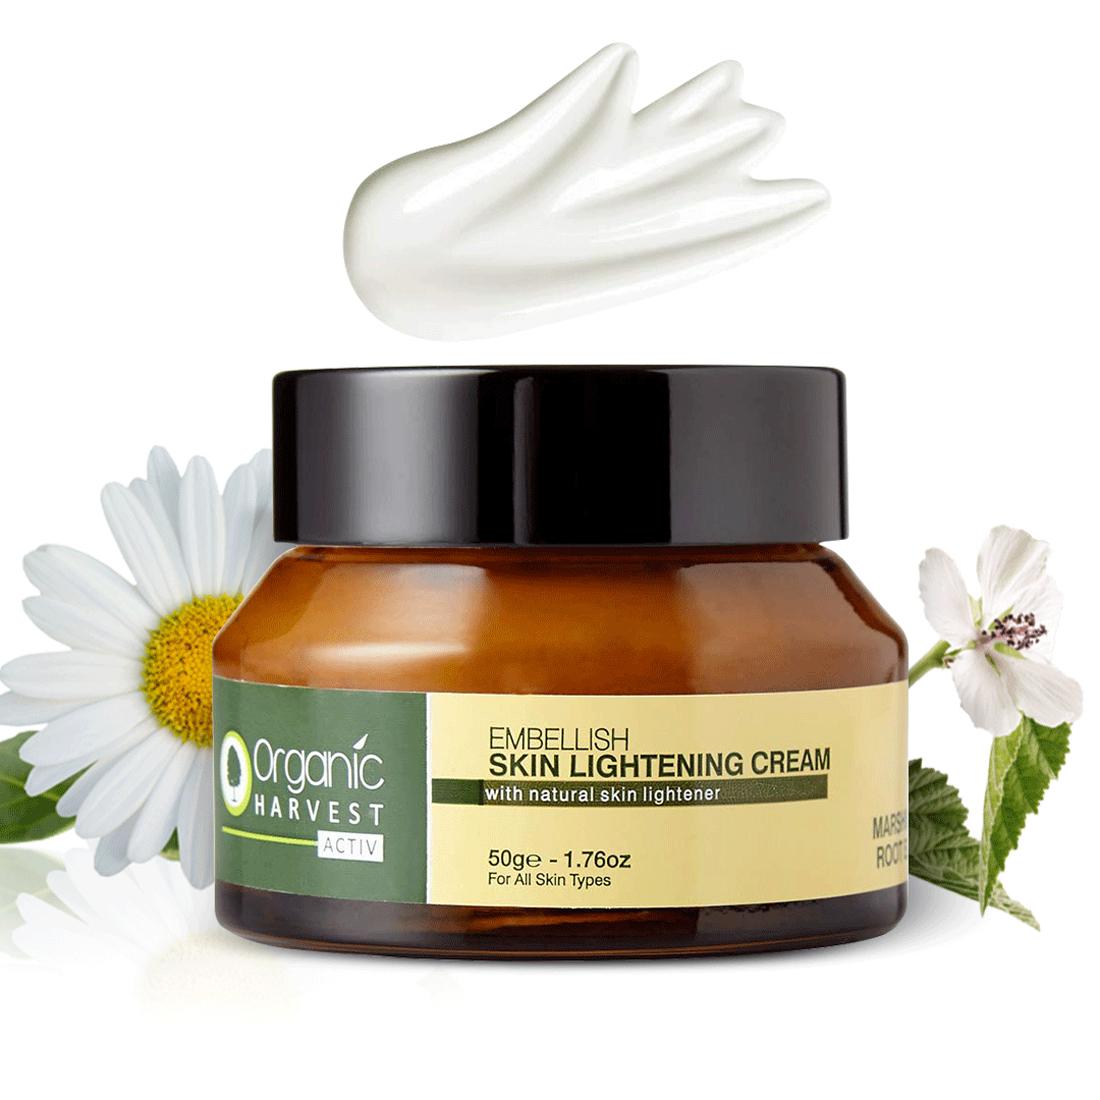 Organic Harvest | Skin Lightening Cream Activ Range, 50gm